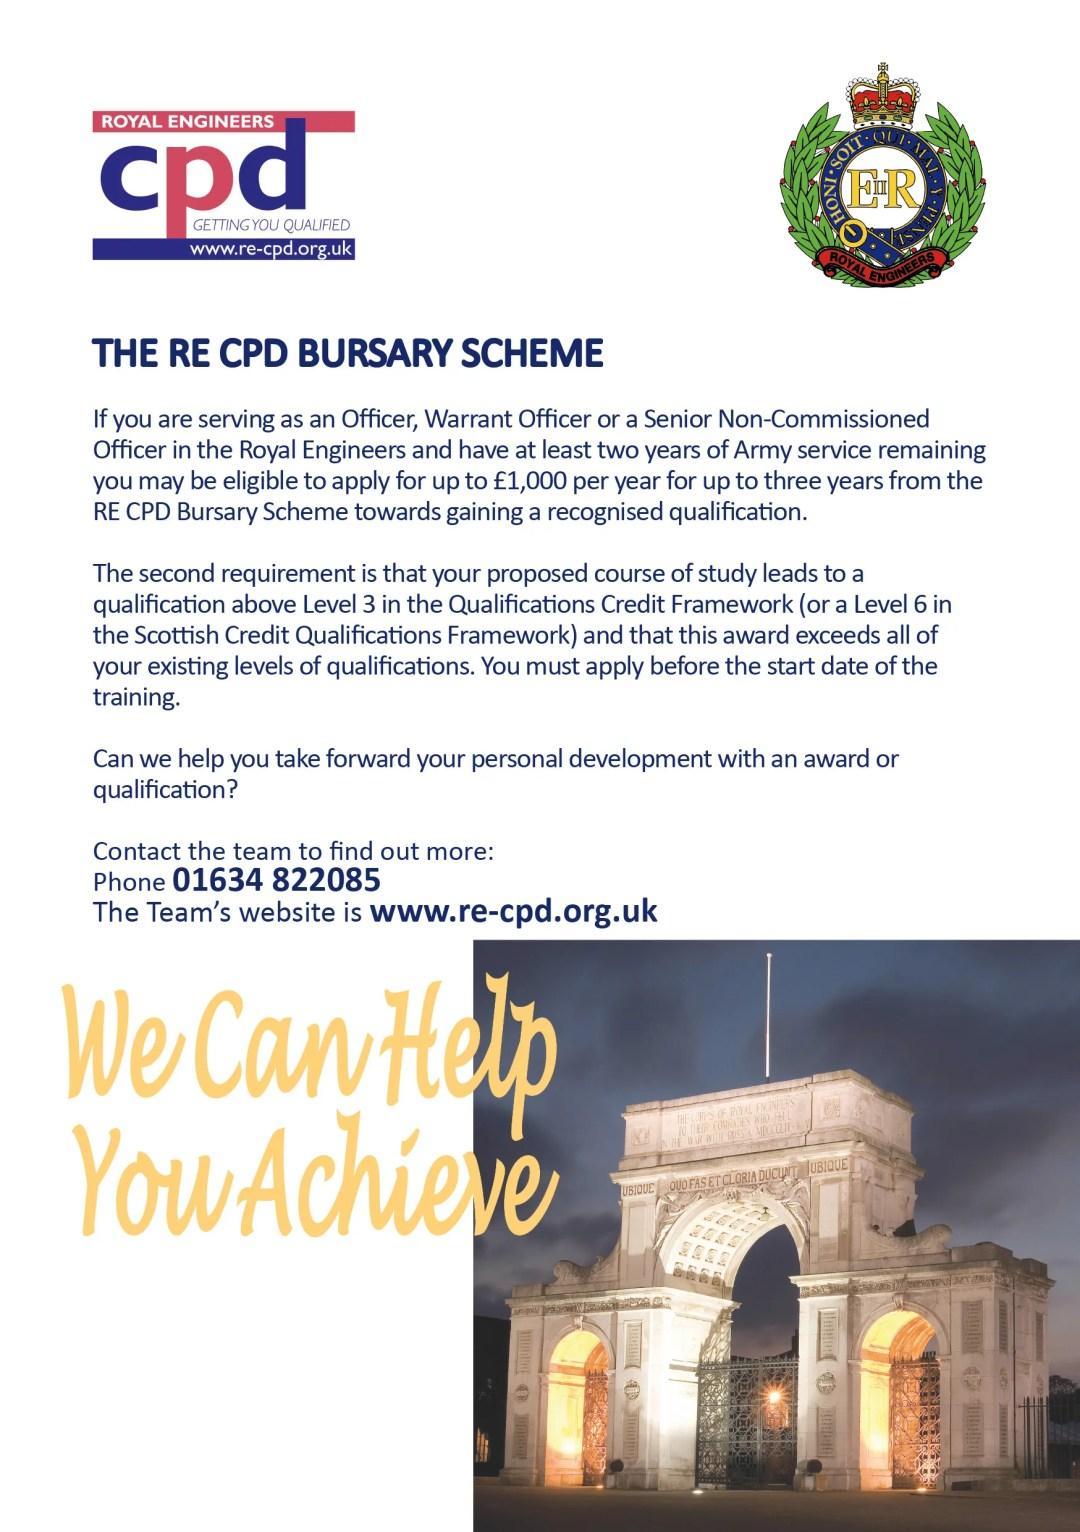 The RE CPD Bursary Scheme